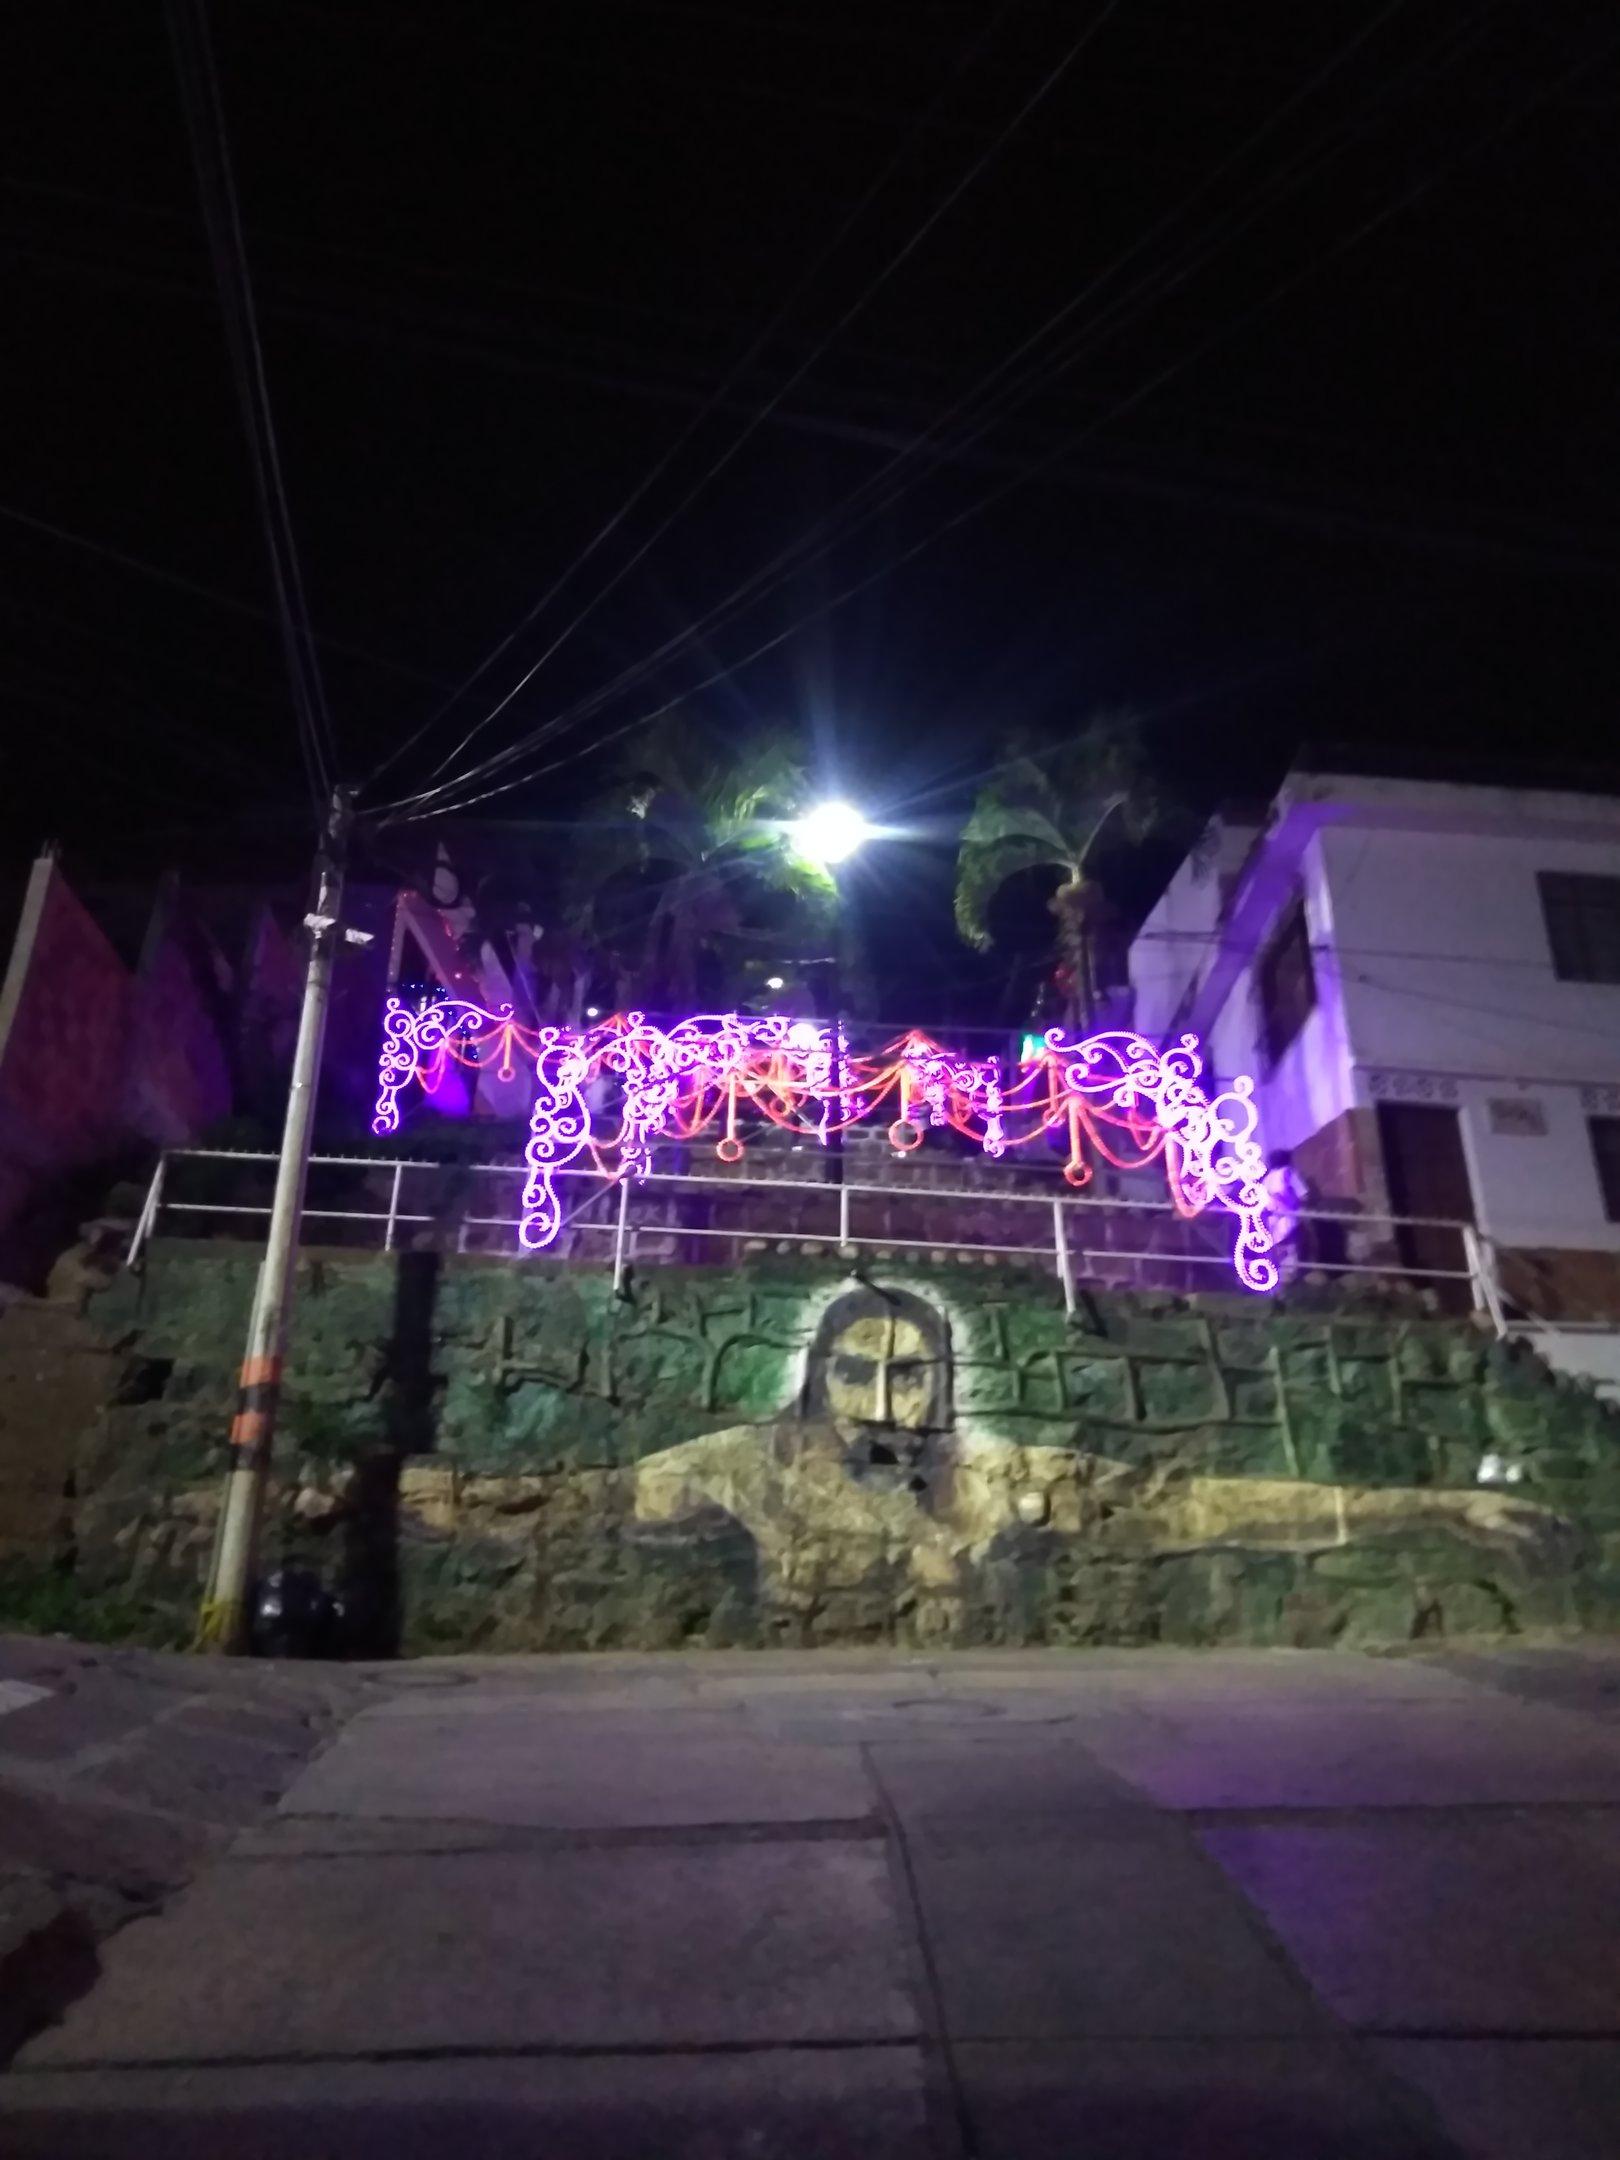 img_20181209_192811-jpg.49905_Public murals/street art/other images from São Paulo, Brazil_Art & Music_Squat the Planet_11:49 AM